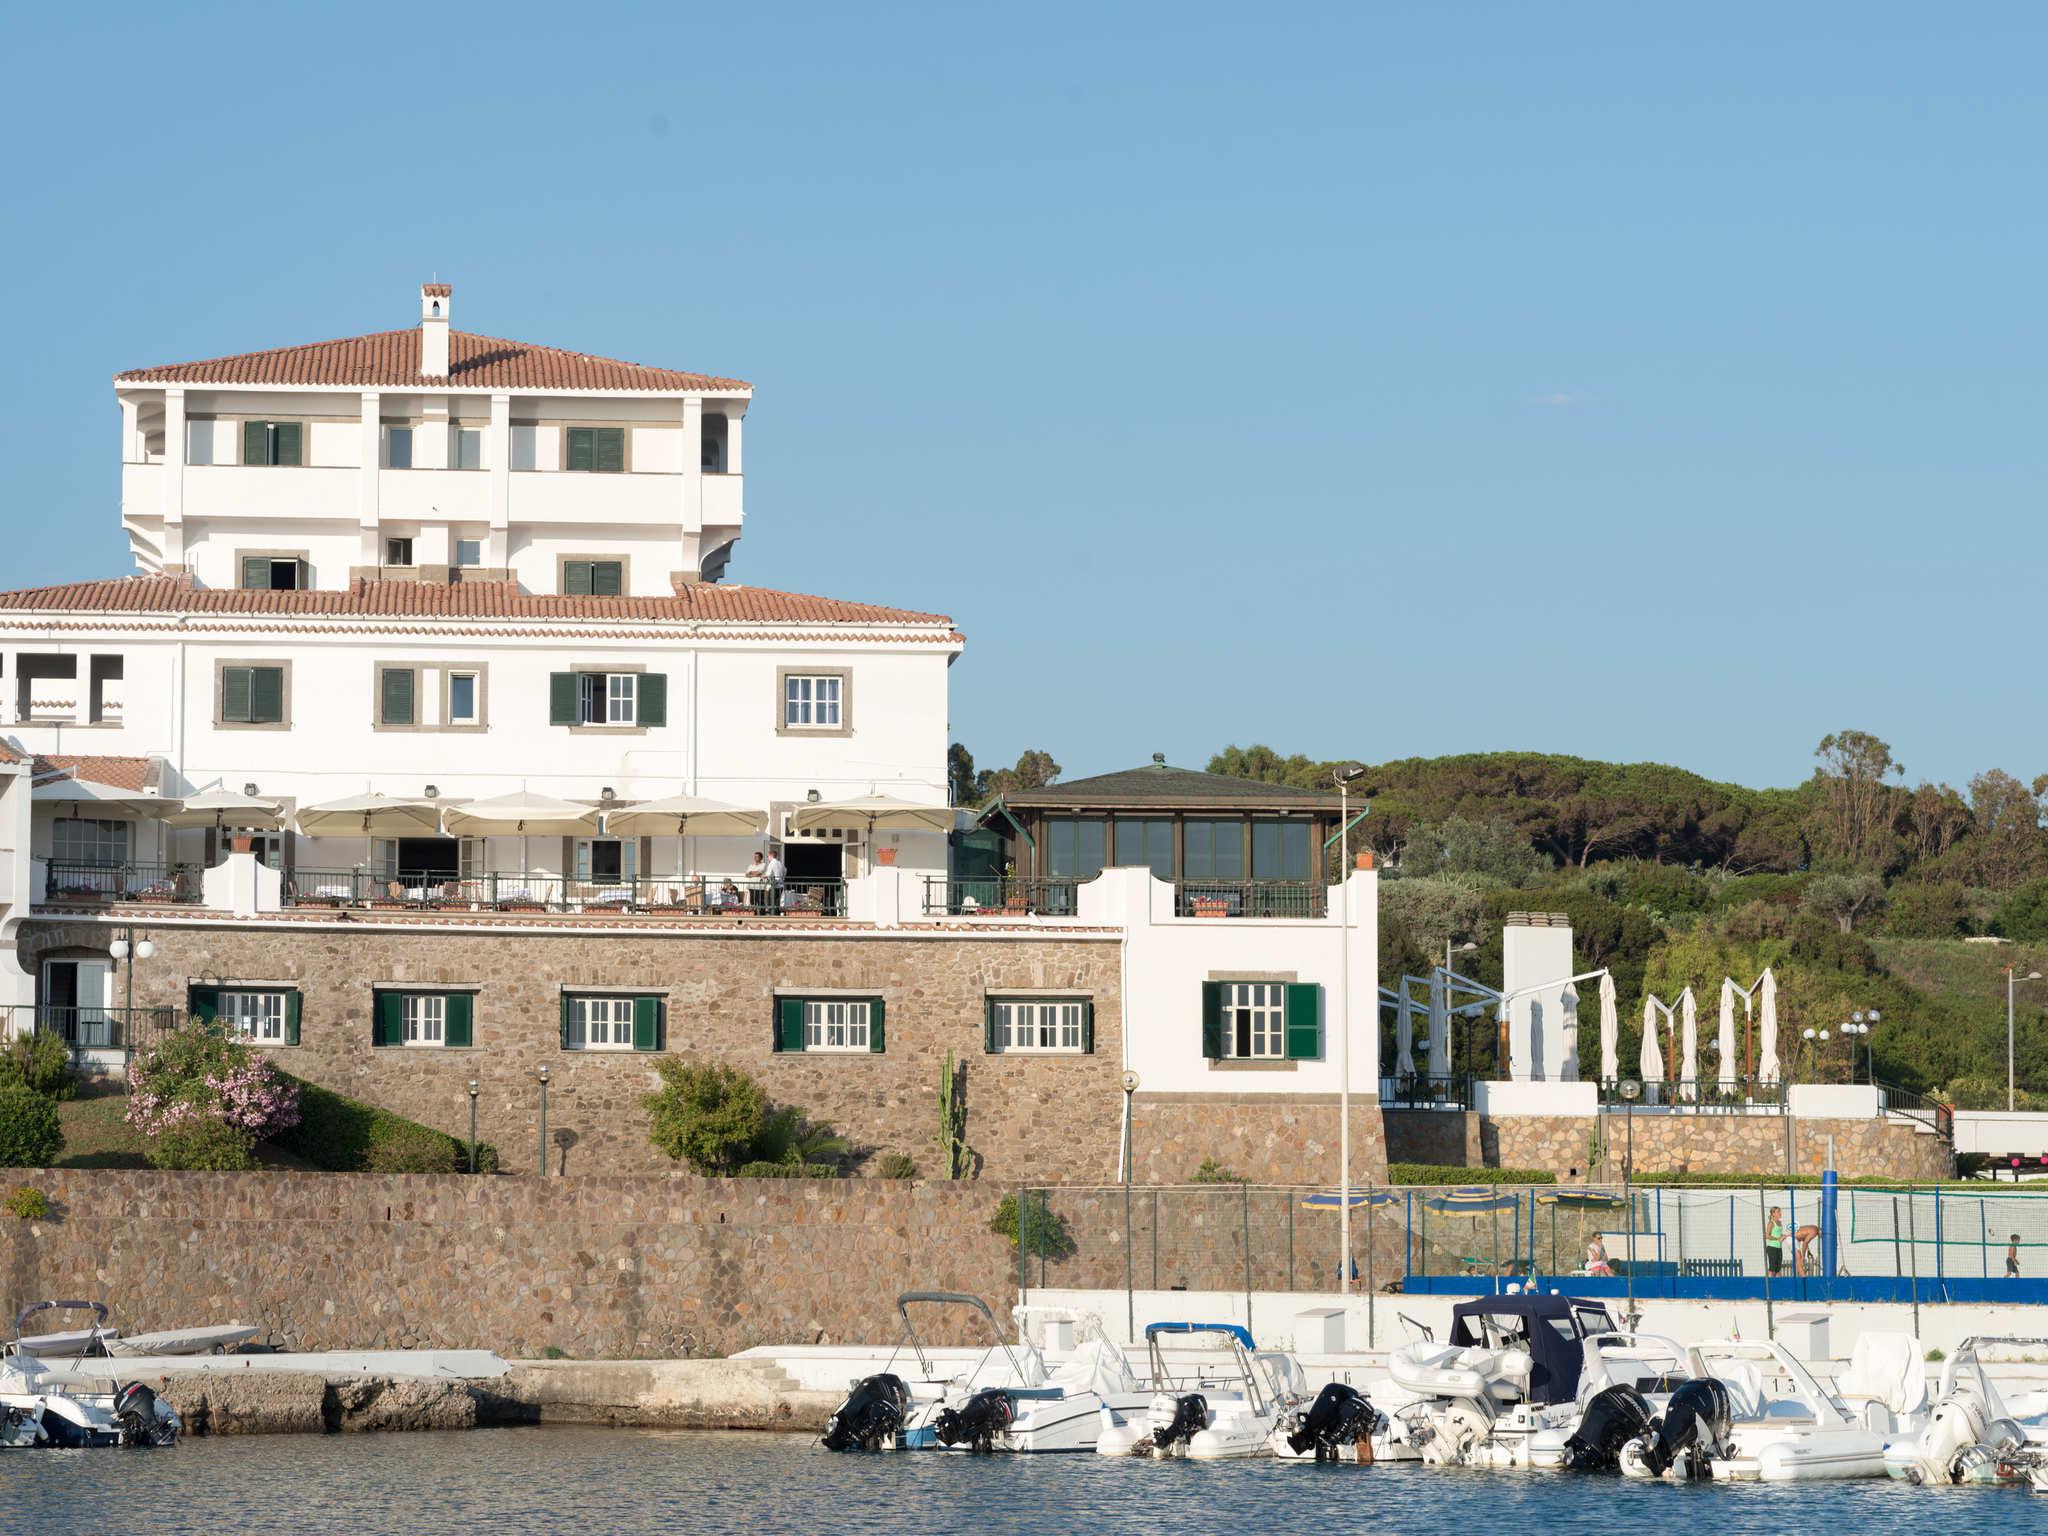 Hotell – Mercure Civitavecchia Sunbay Park Hotel - New Opening